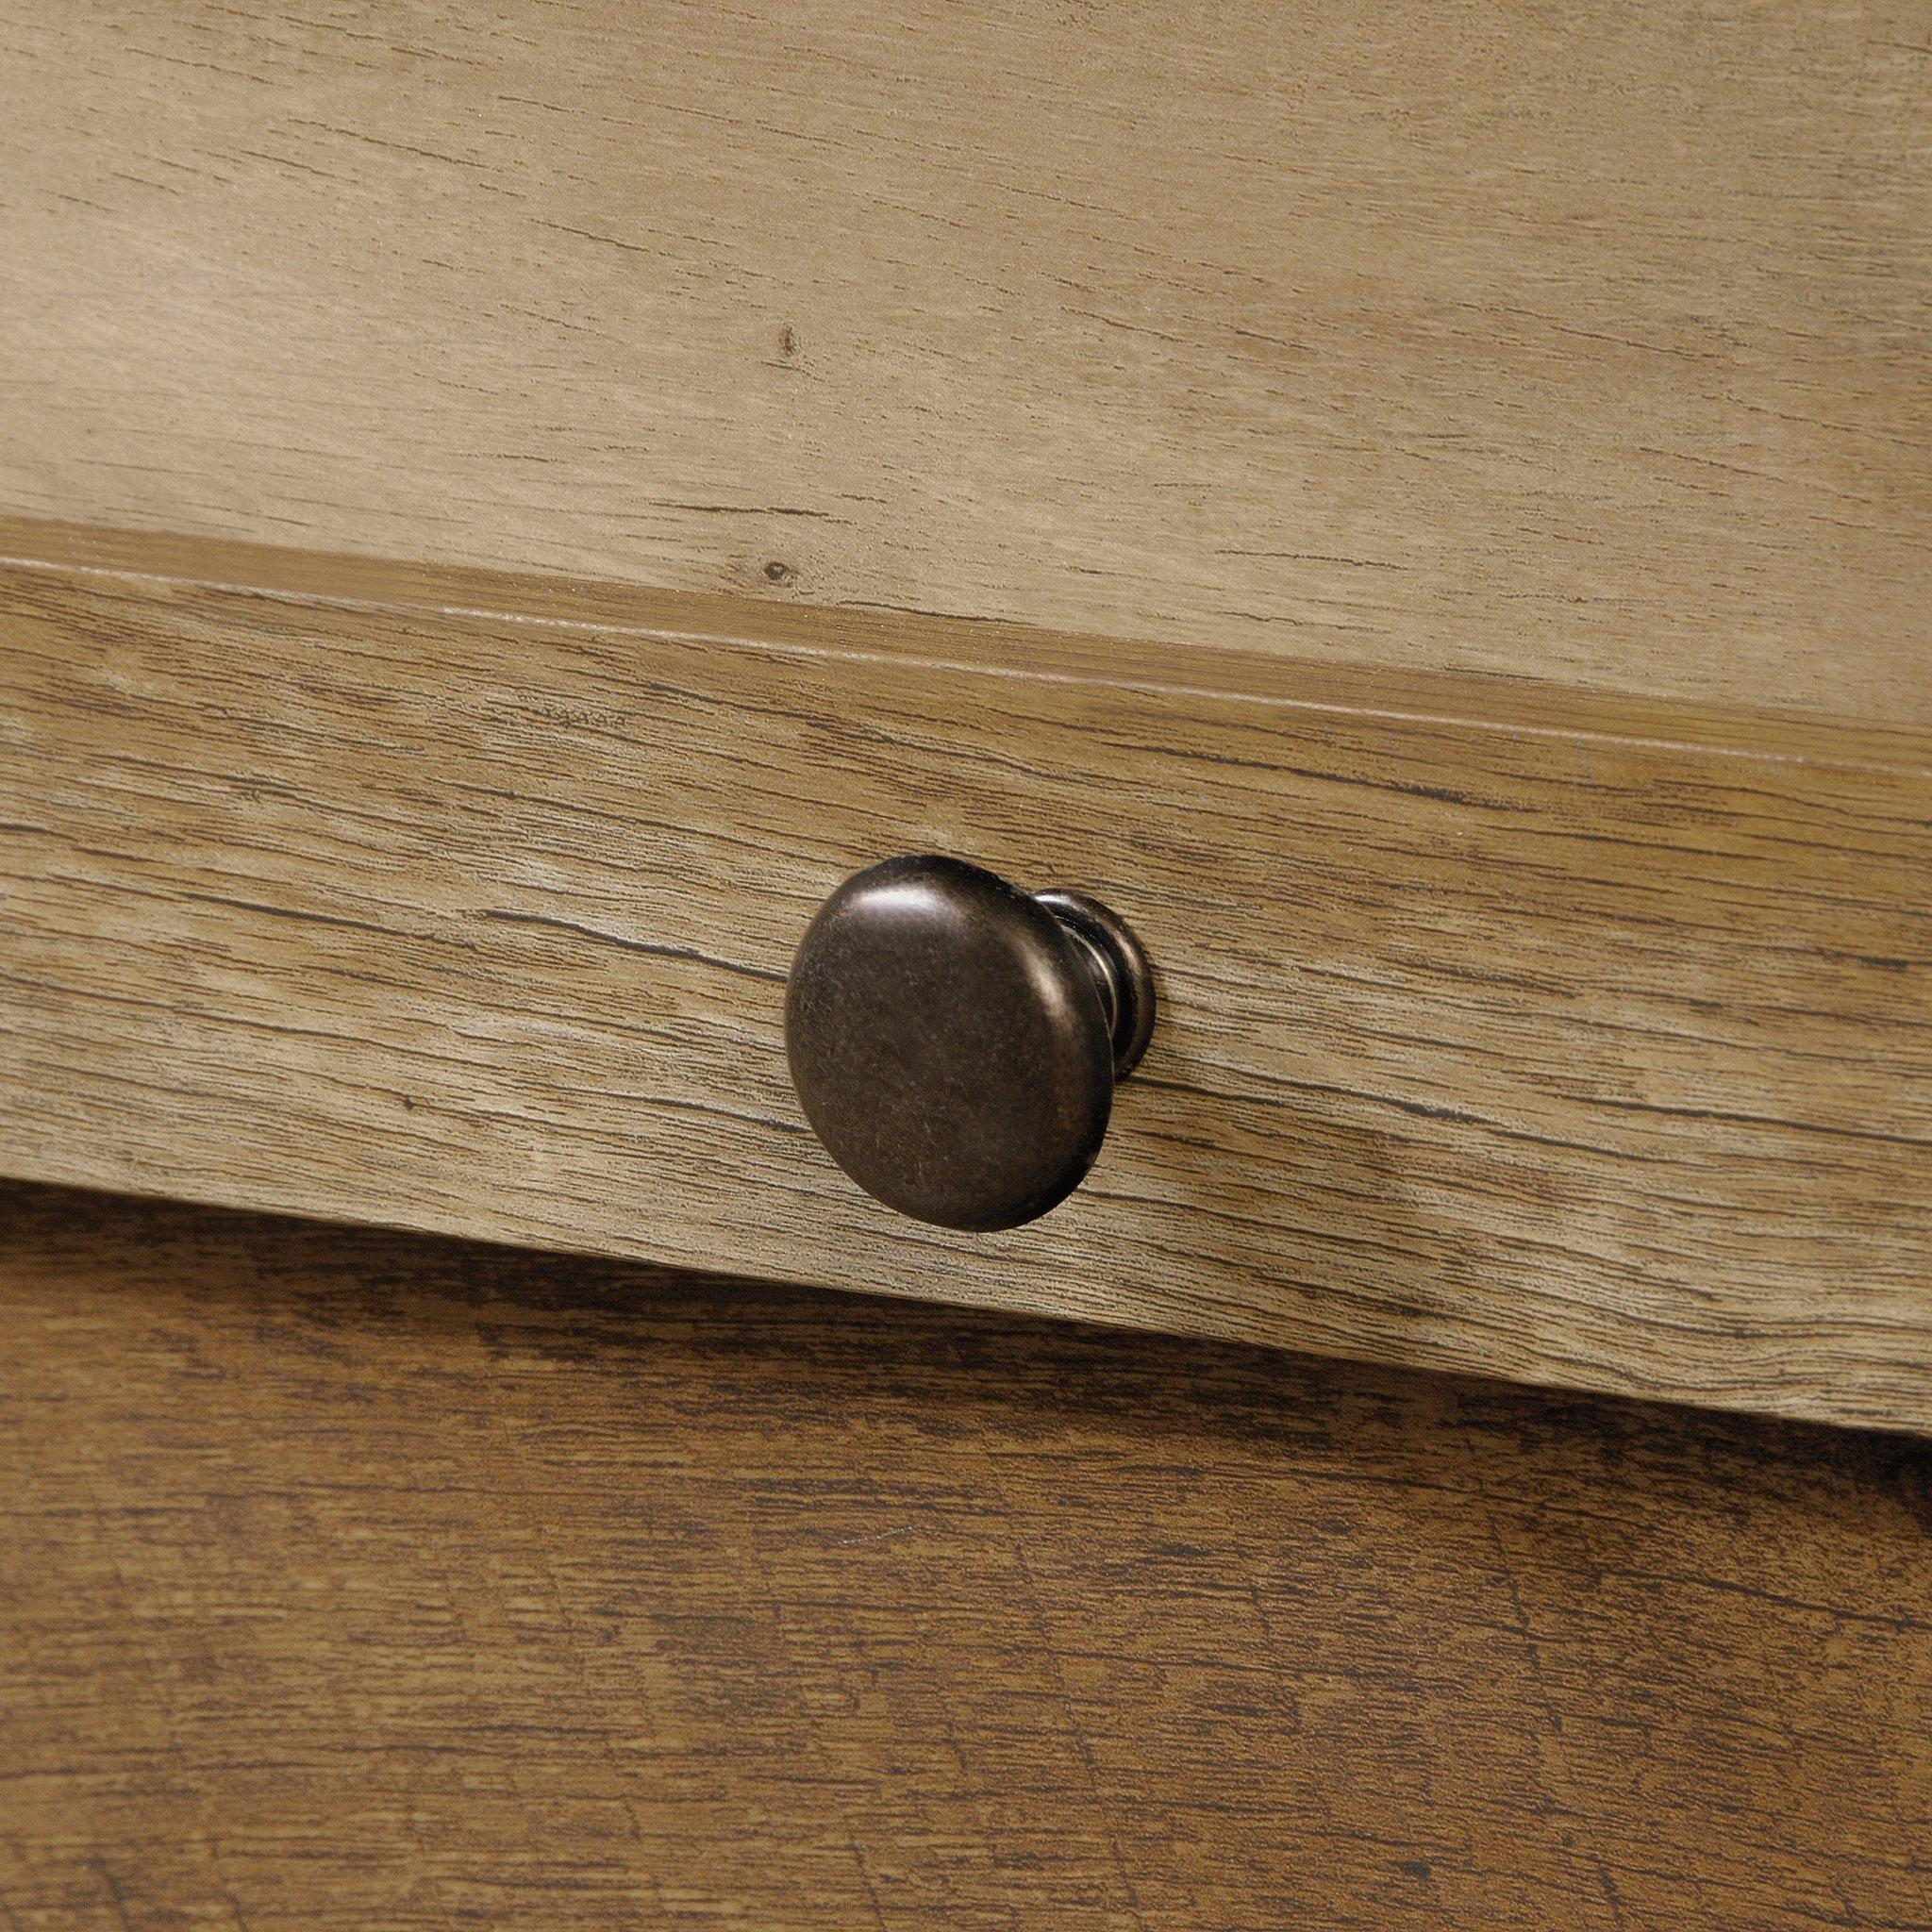 Sauder 419077 Dakota Pass Armoire, 33.78'' L x 19.53'' W x 57.84'' H, Craftsman Oak finish by Sauder (Image #8)